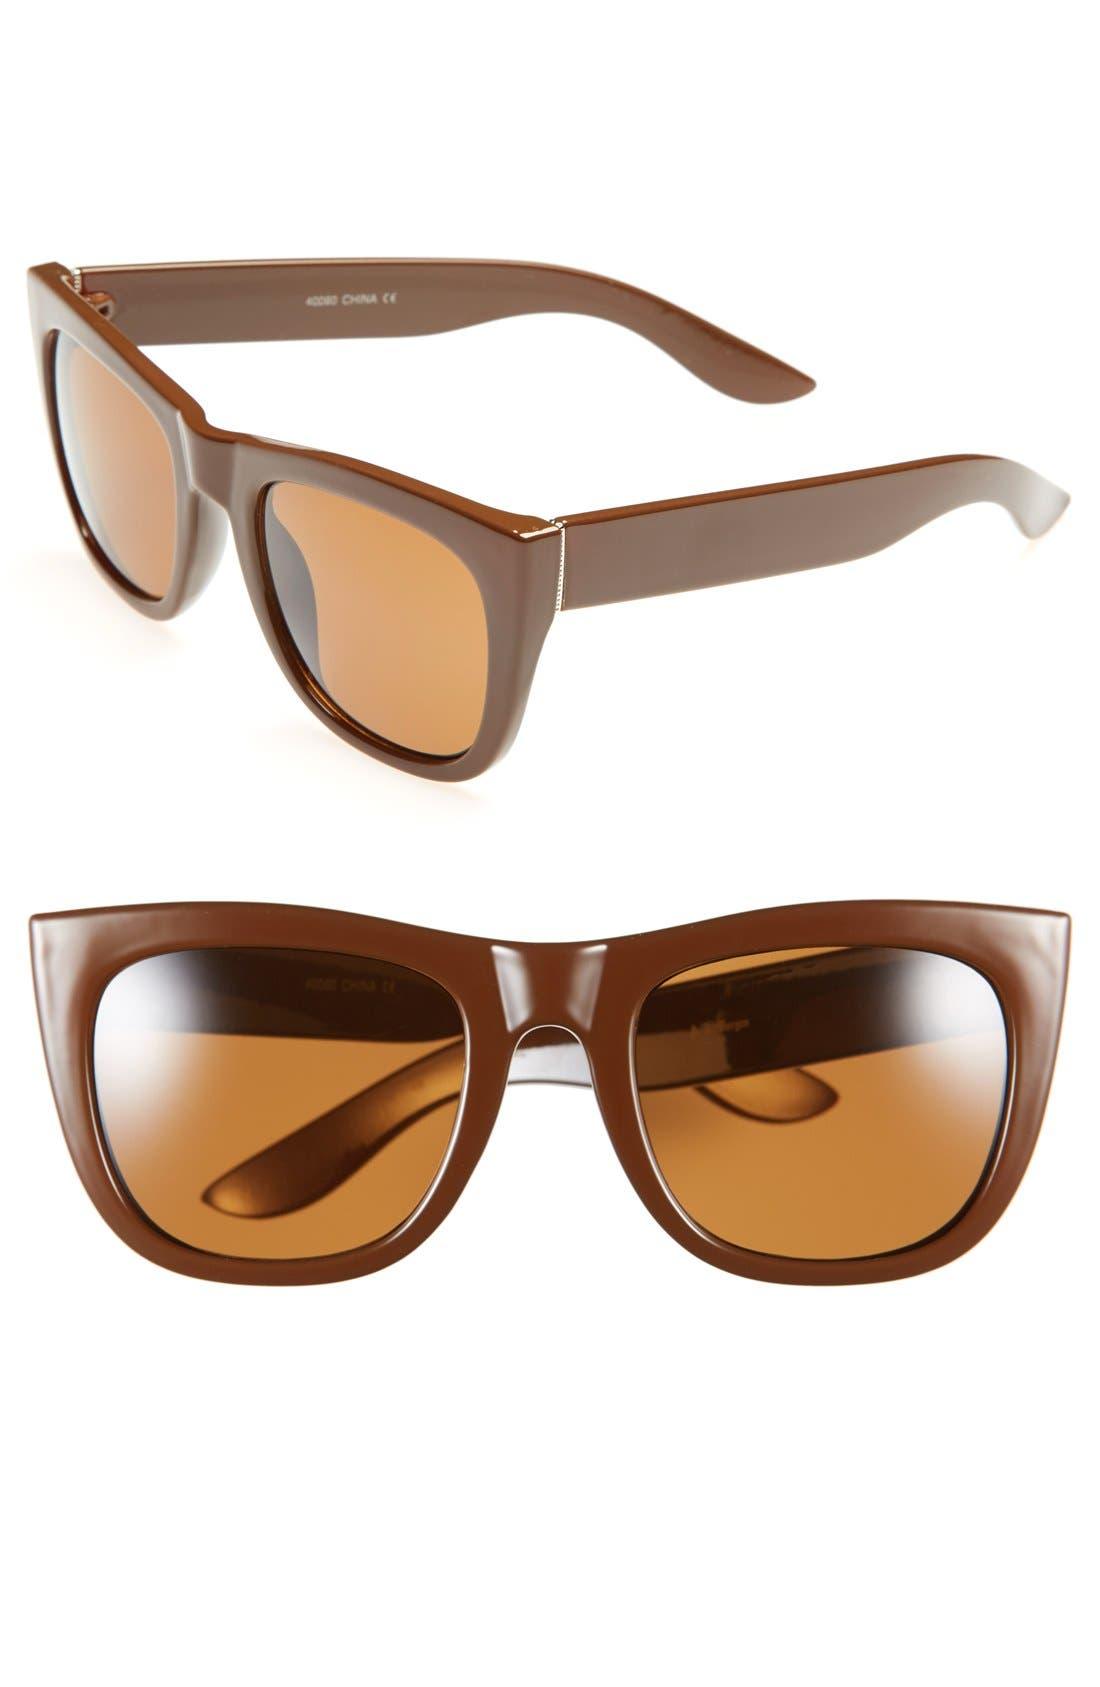 Main Image - A.J. Morgan 'Manage' 51mm Sunglasses